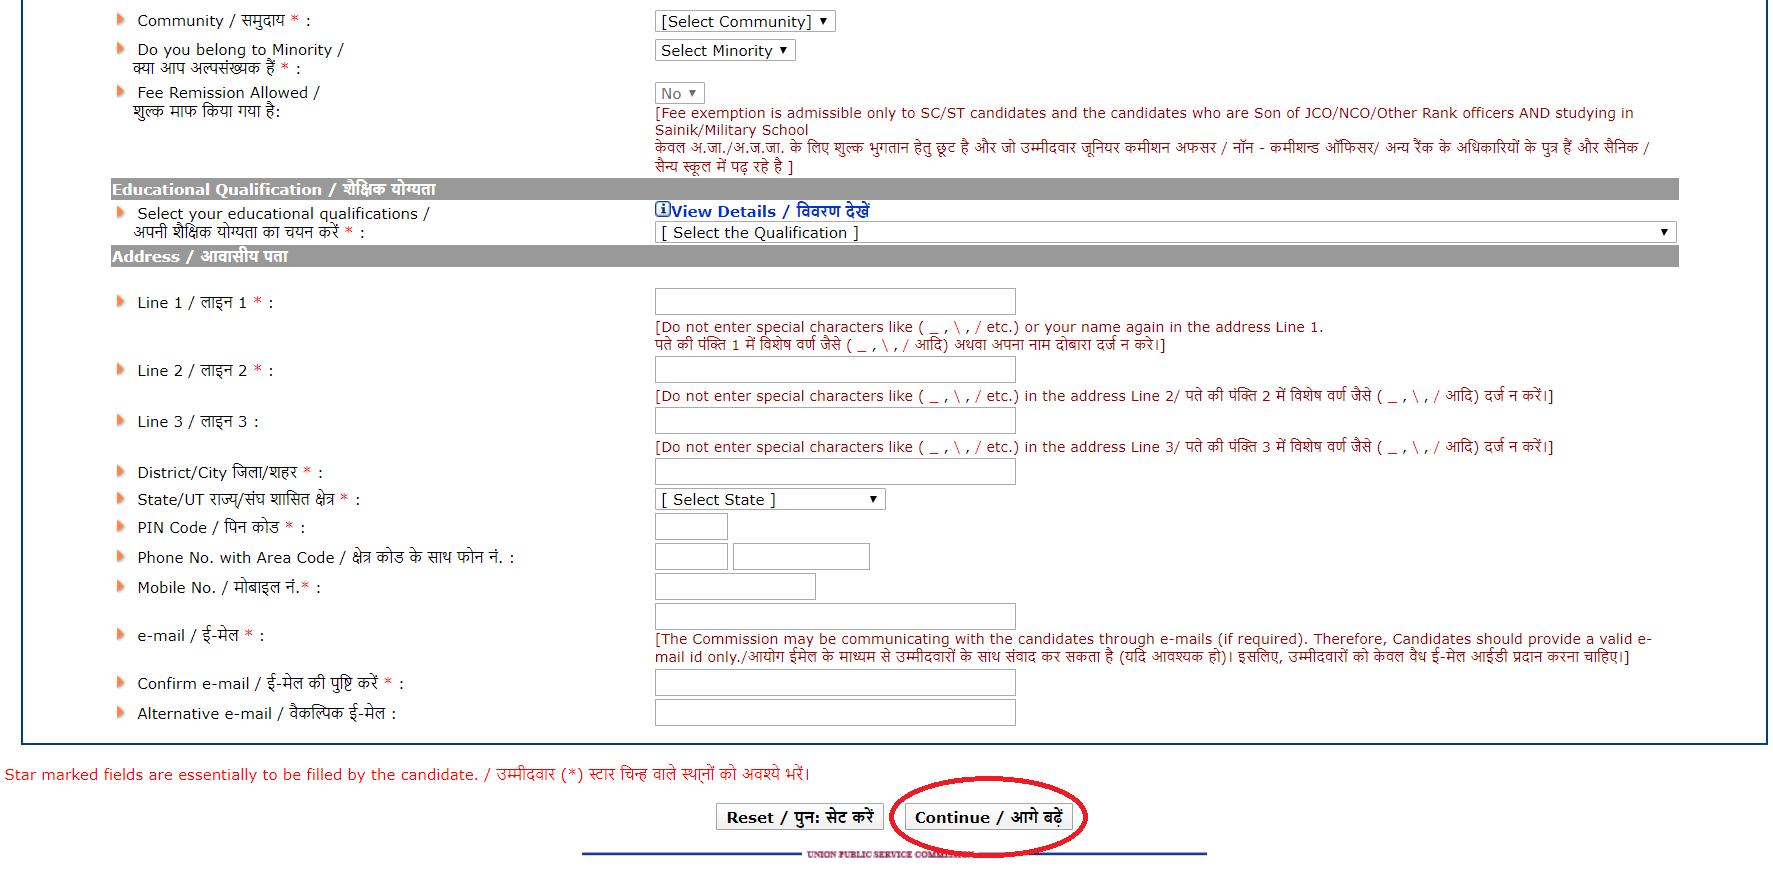 UPSC Registration Submit